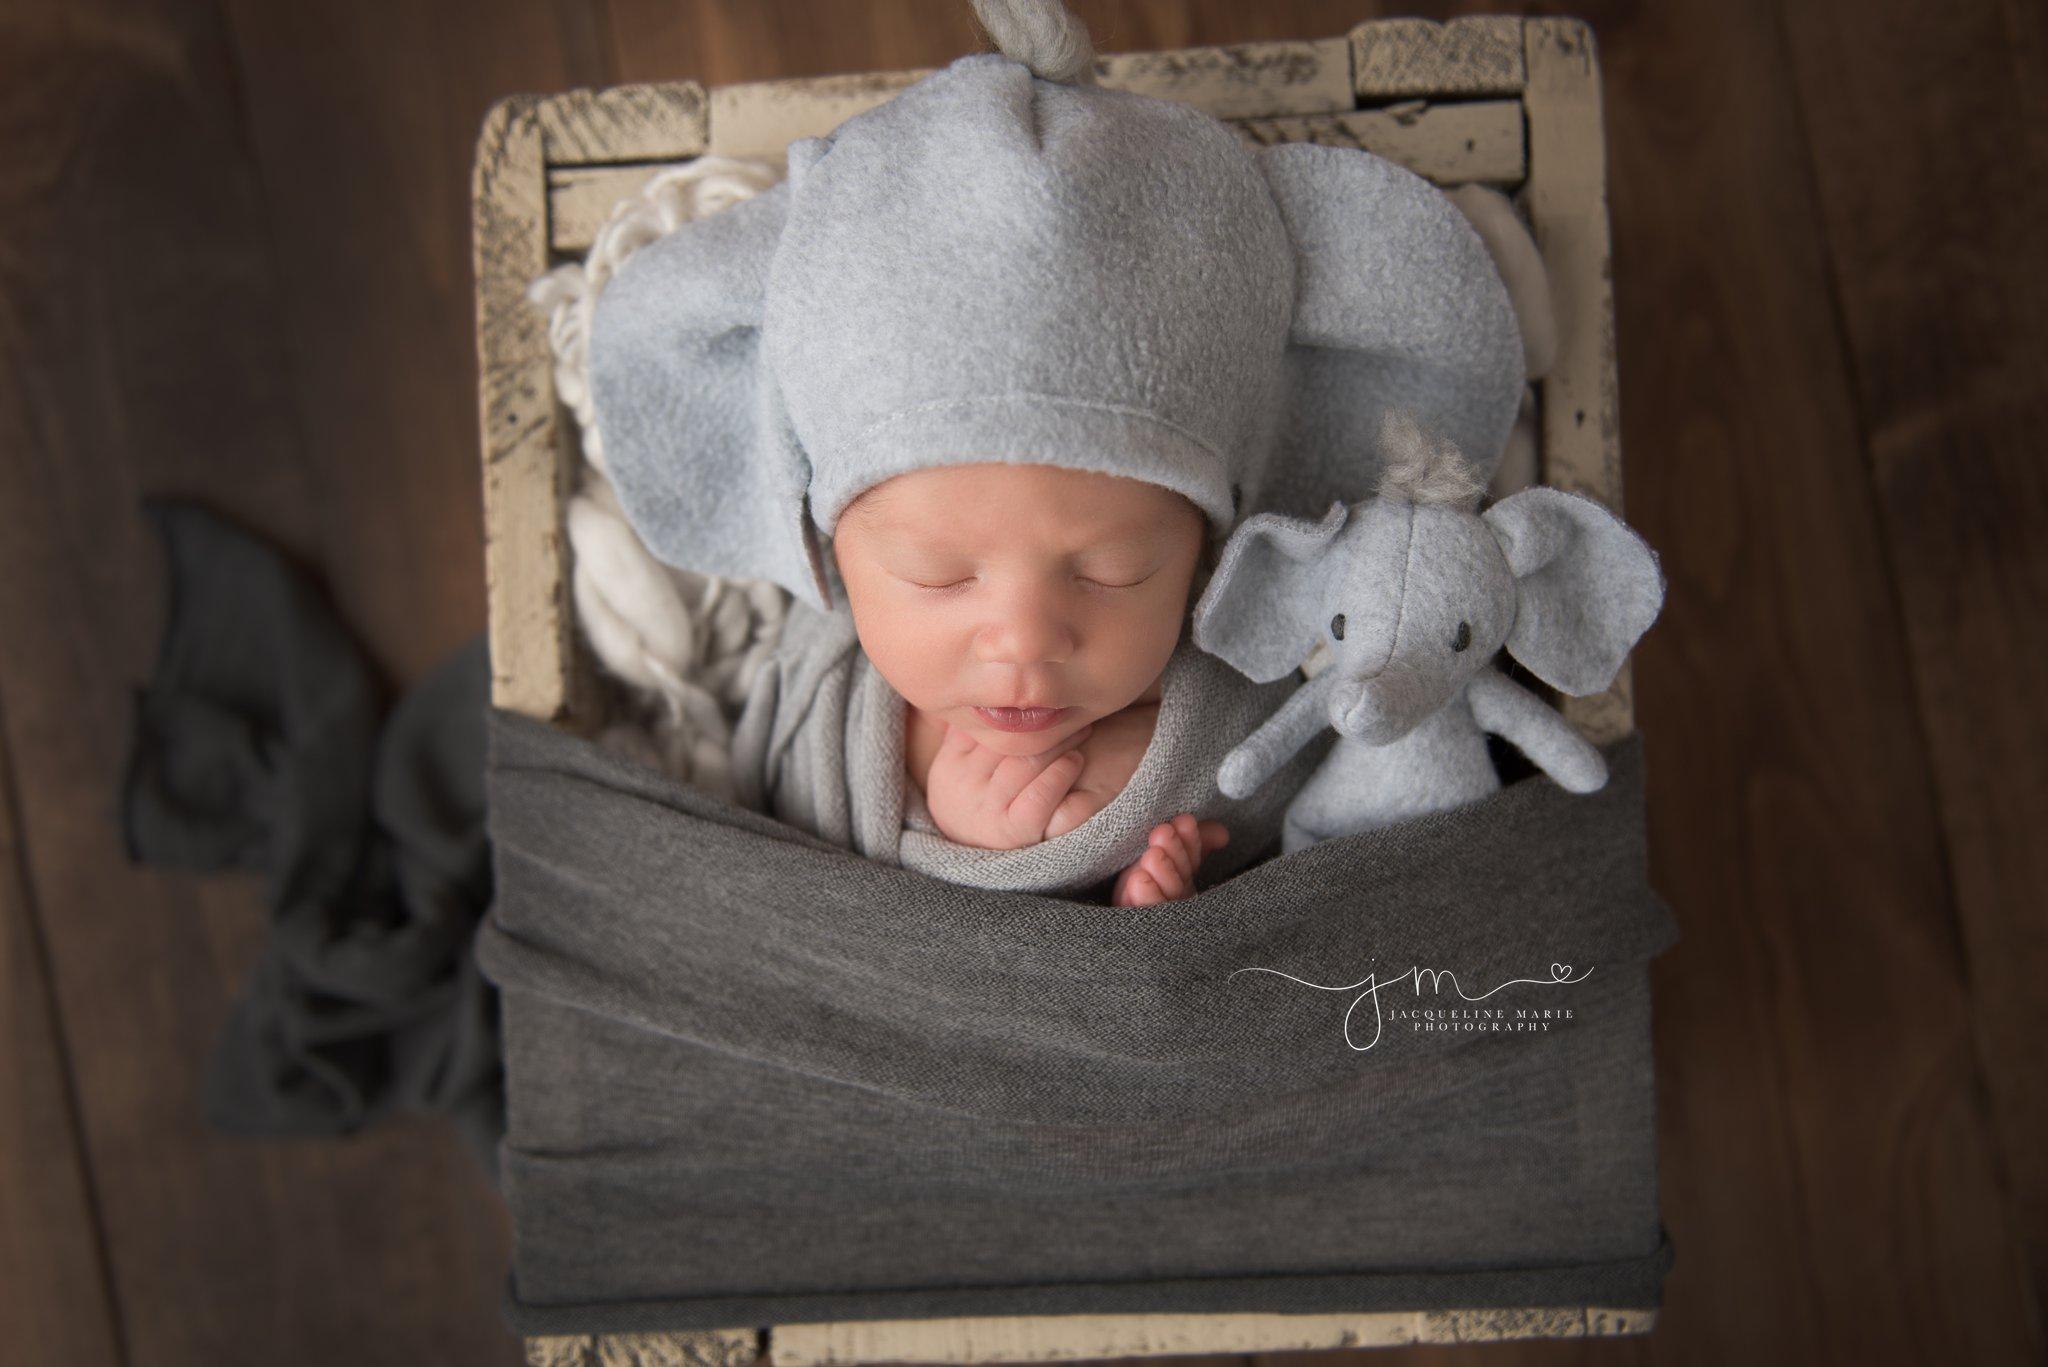 columbus ohio newborn photographer features newborn baby boy wearing elephant hat for newborn pictures